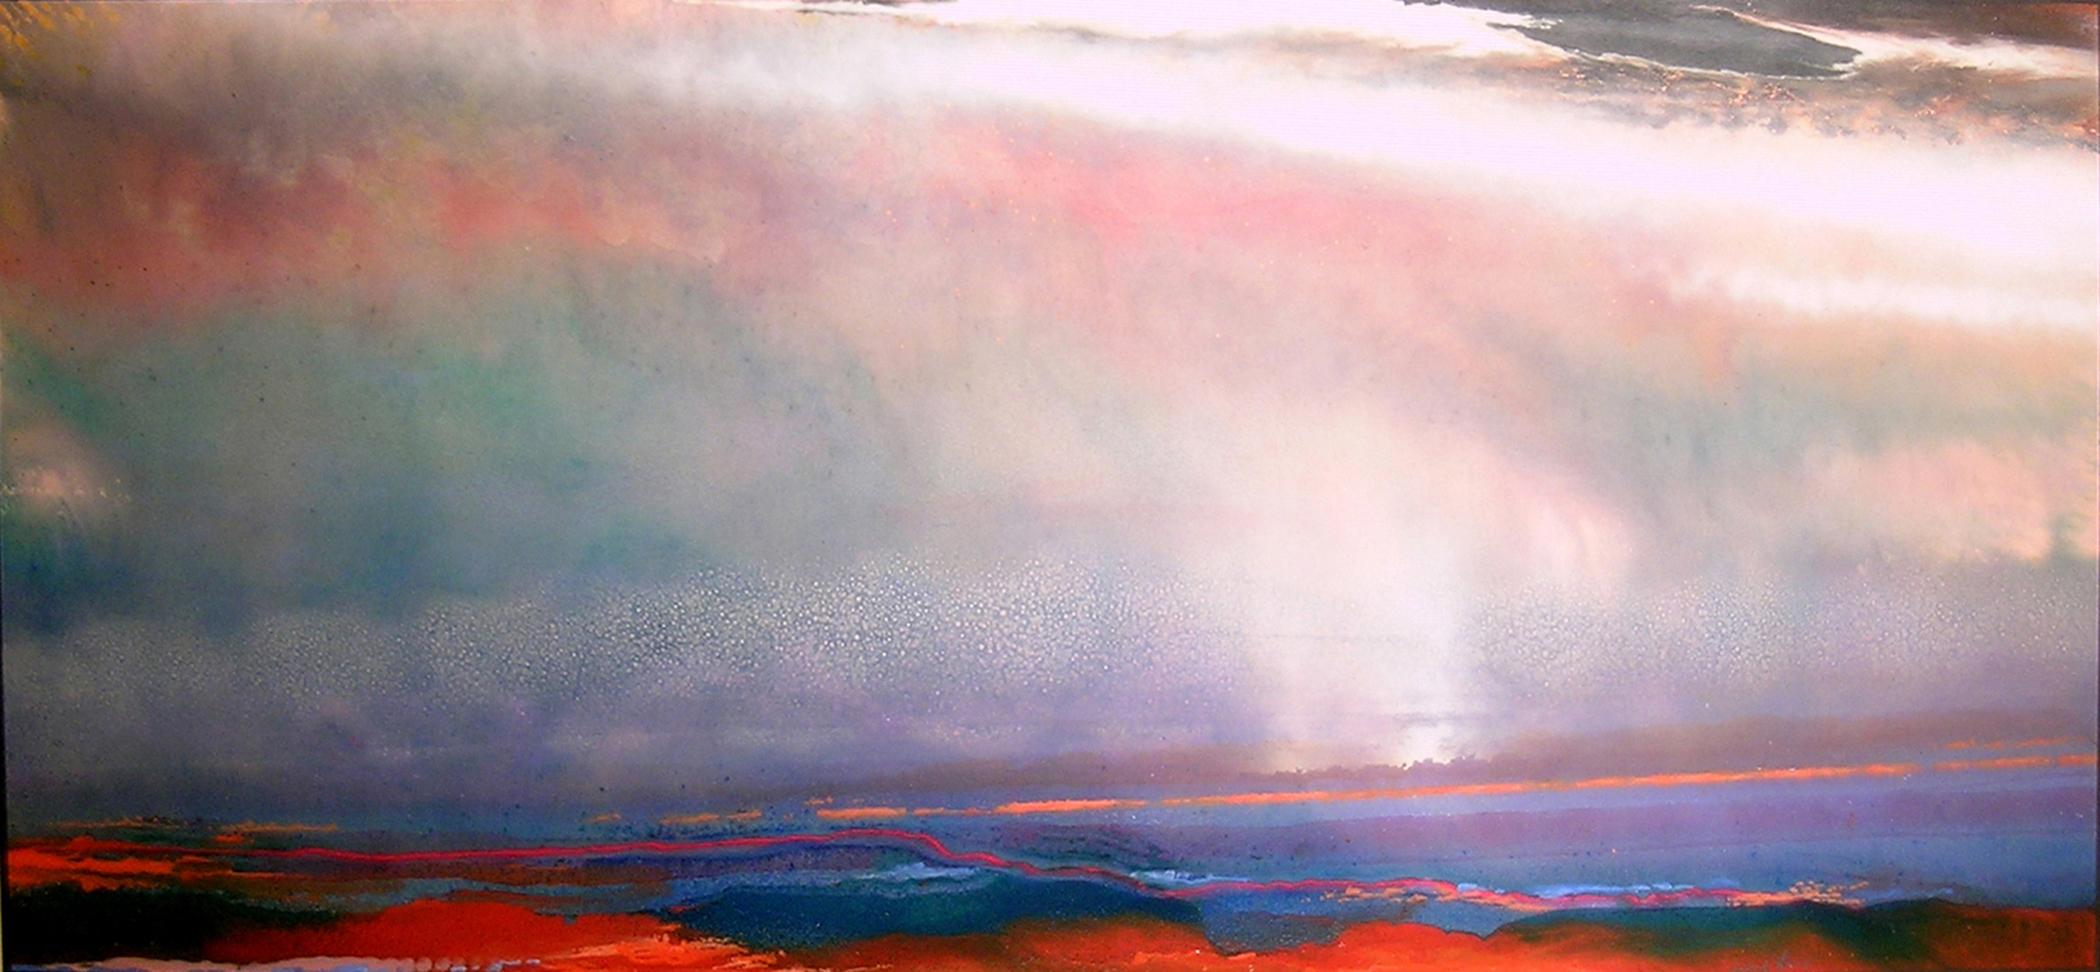 CONCERTO_IN_BLUE_II_oil_36x80_ins_Artist